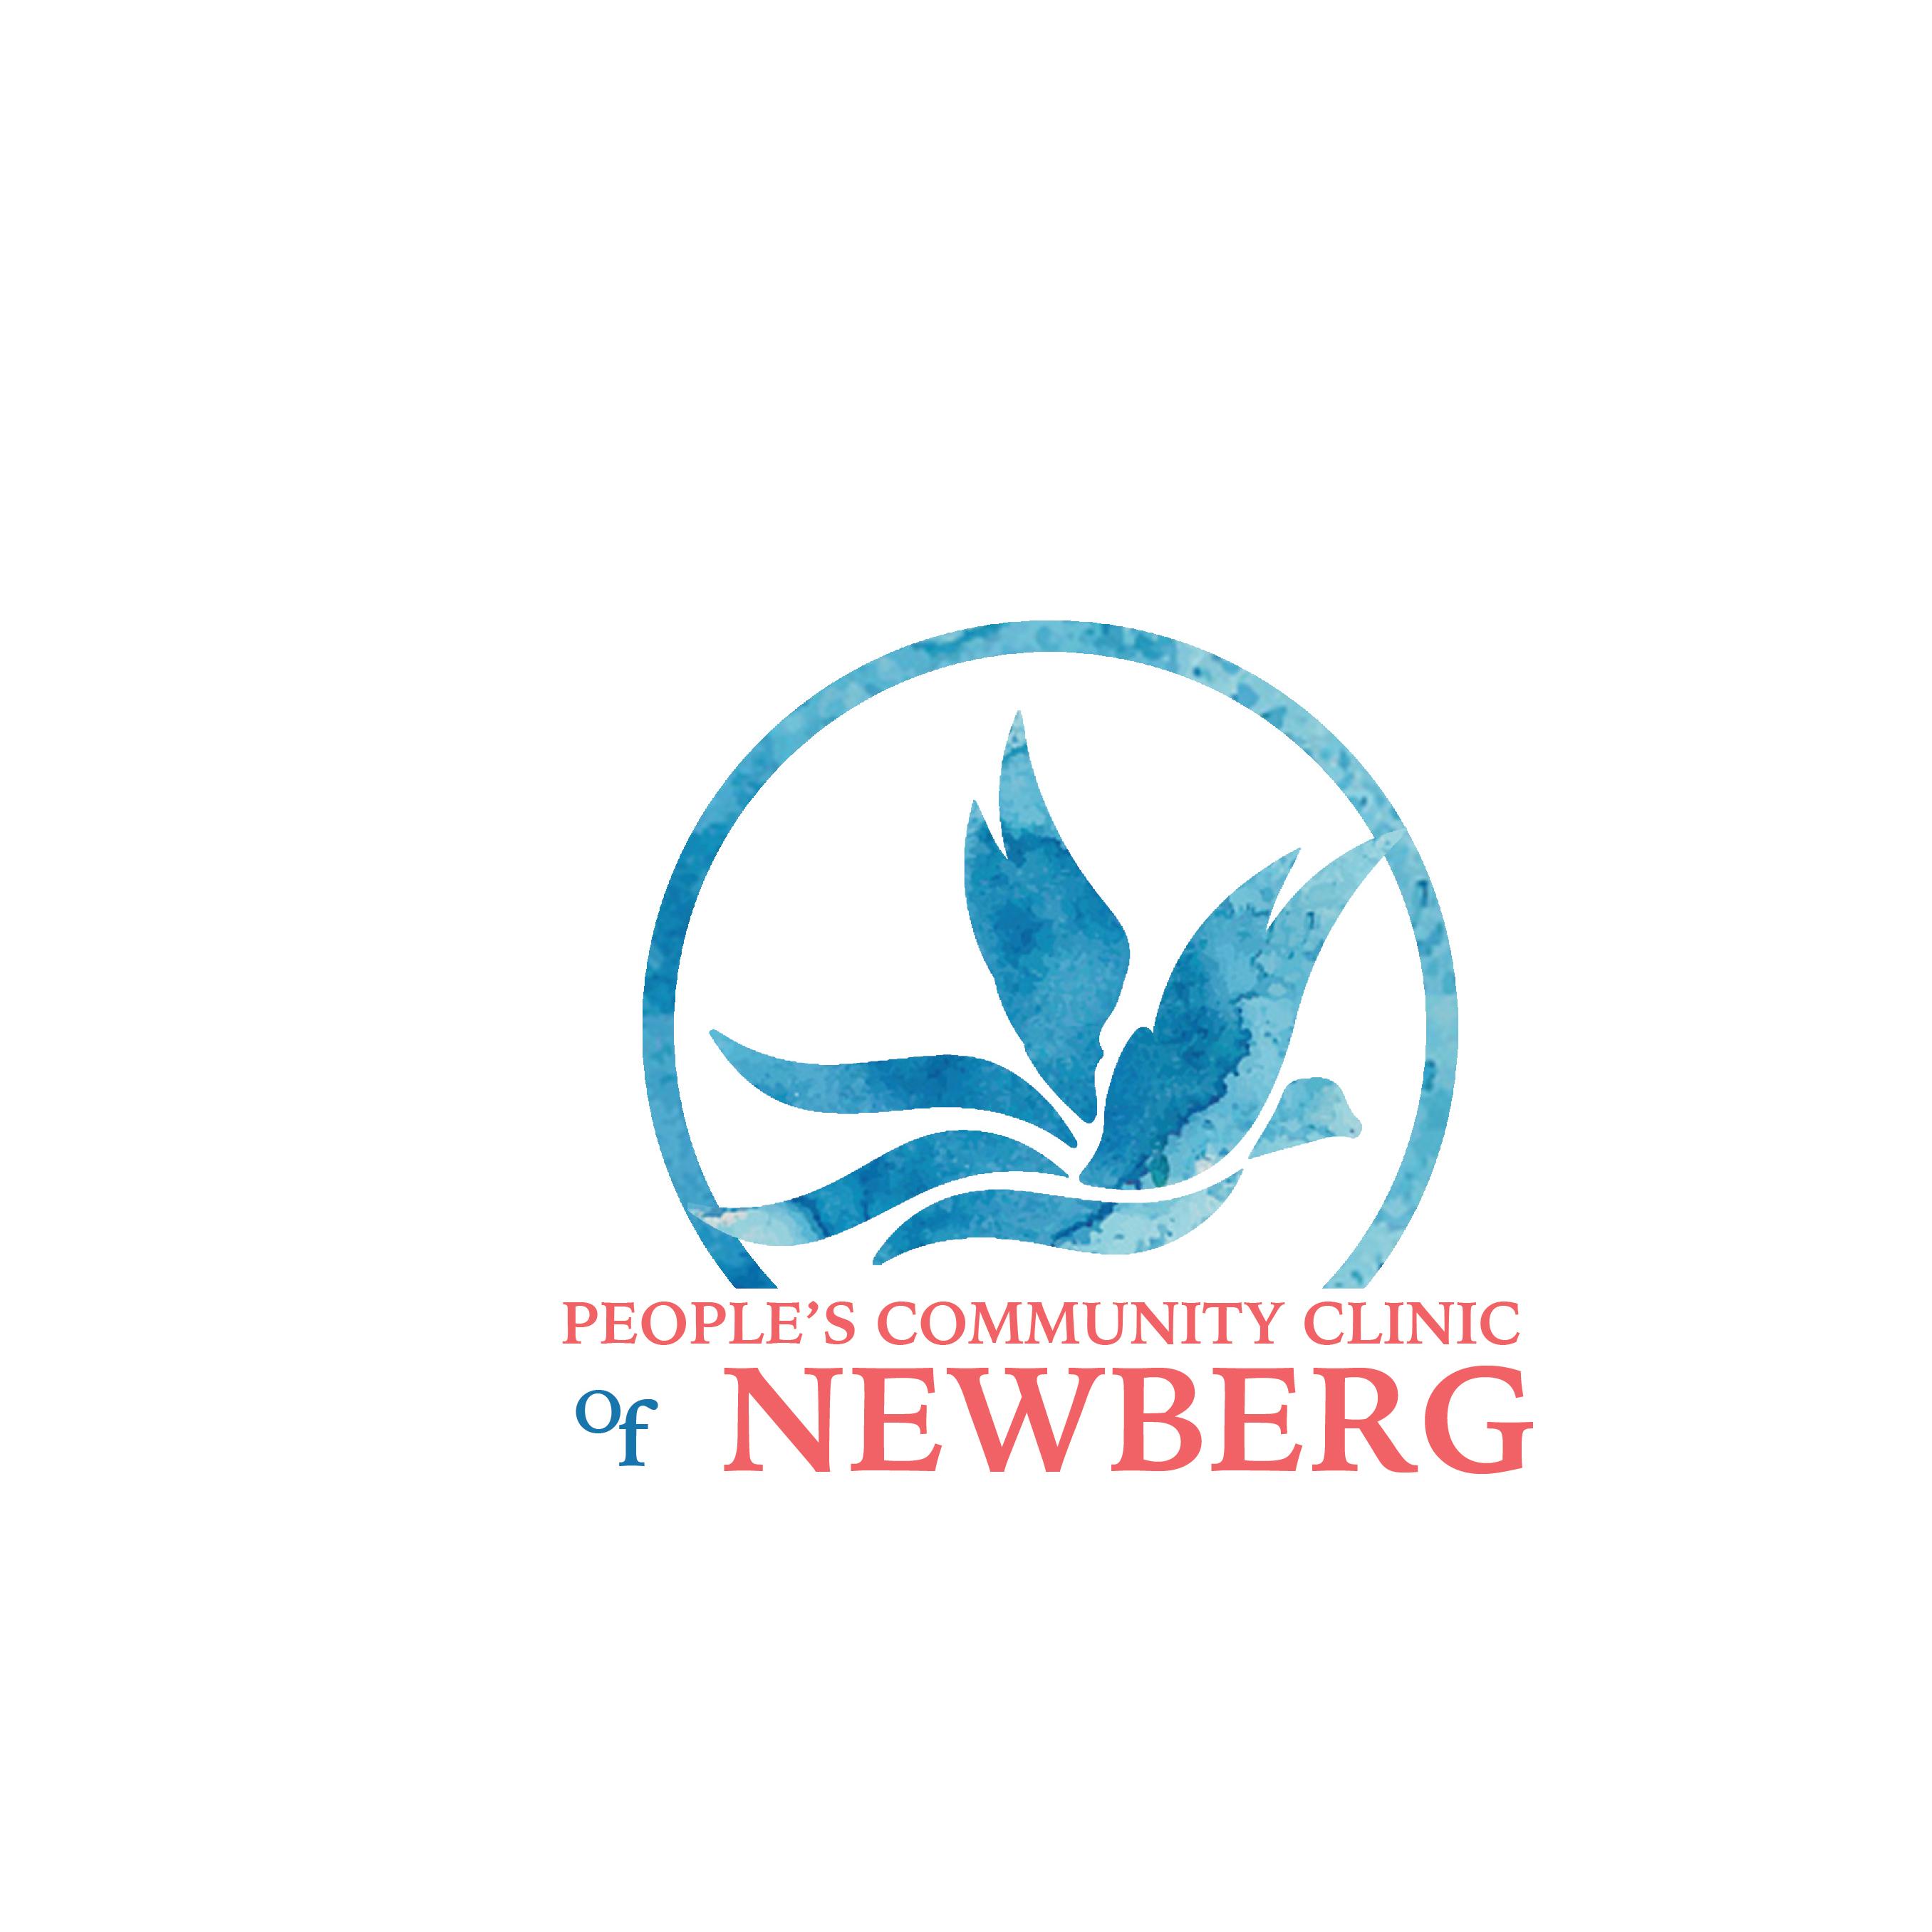 People's Community Clinic of Newberg